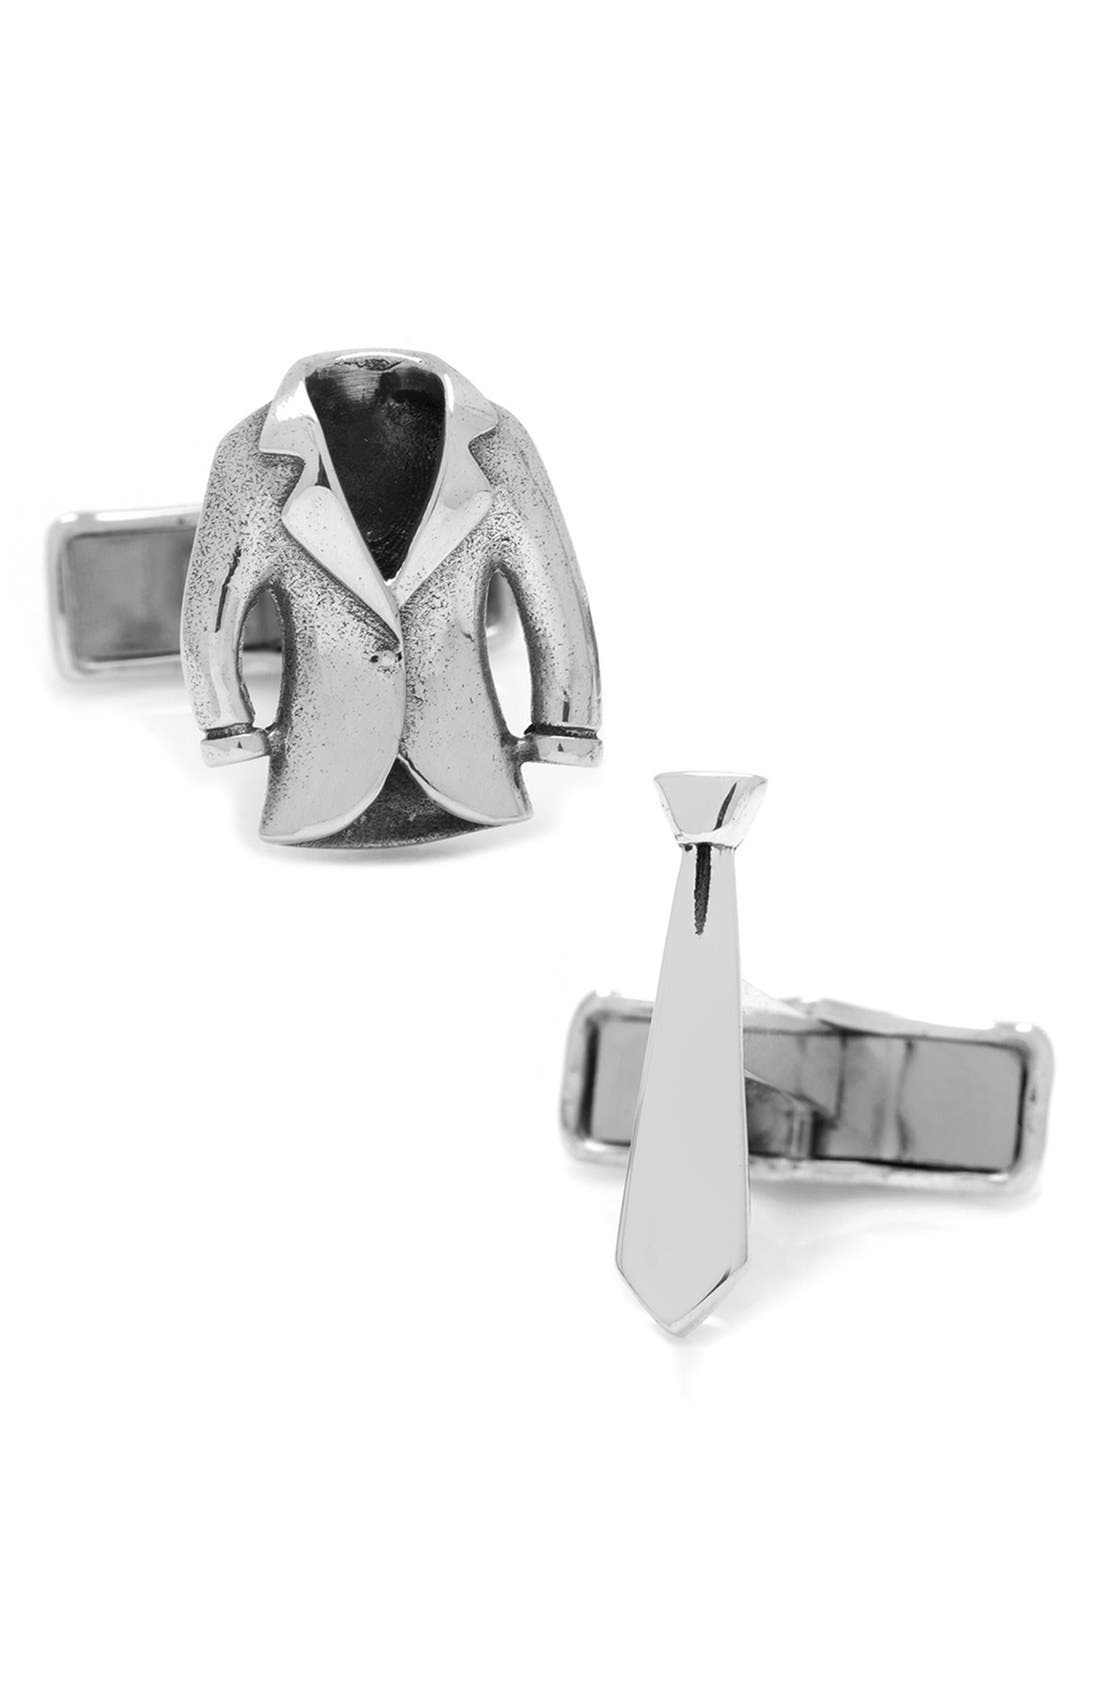 Suit & Tie Cuff Links,                             Main thumbnail 1, color,                             040